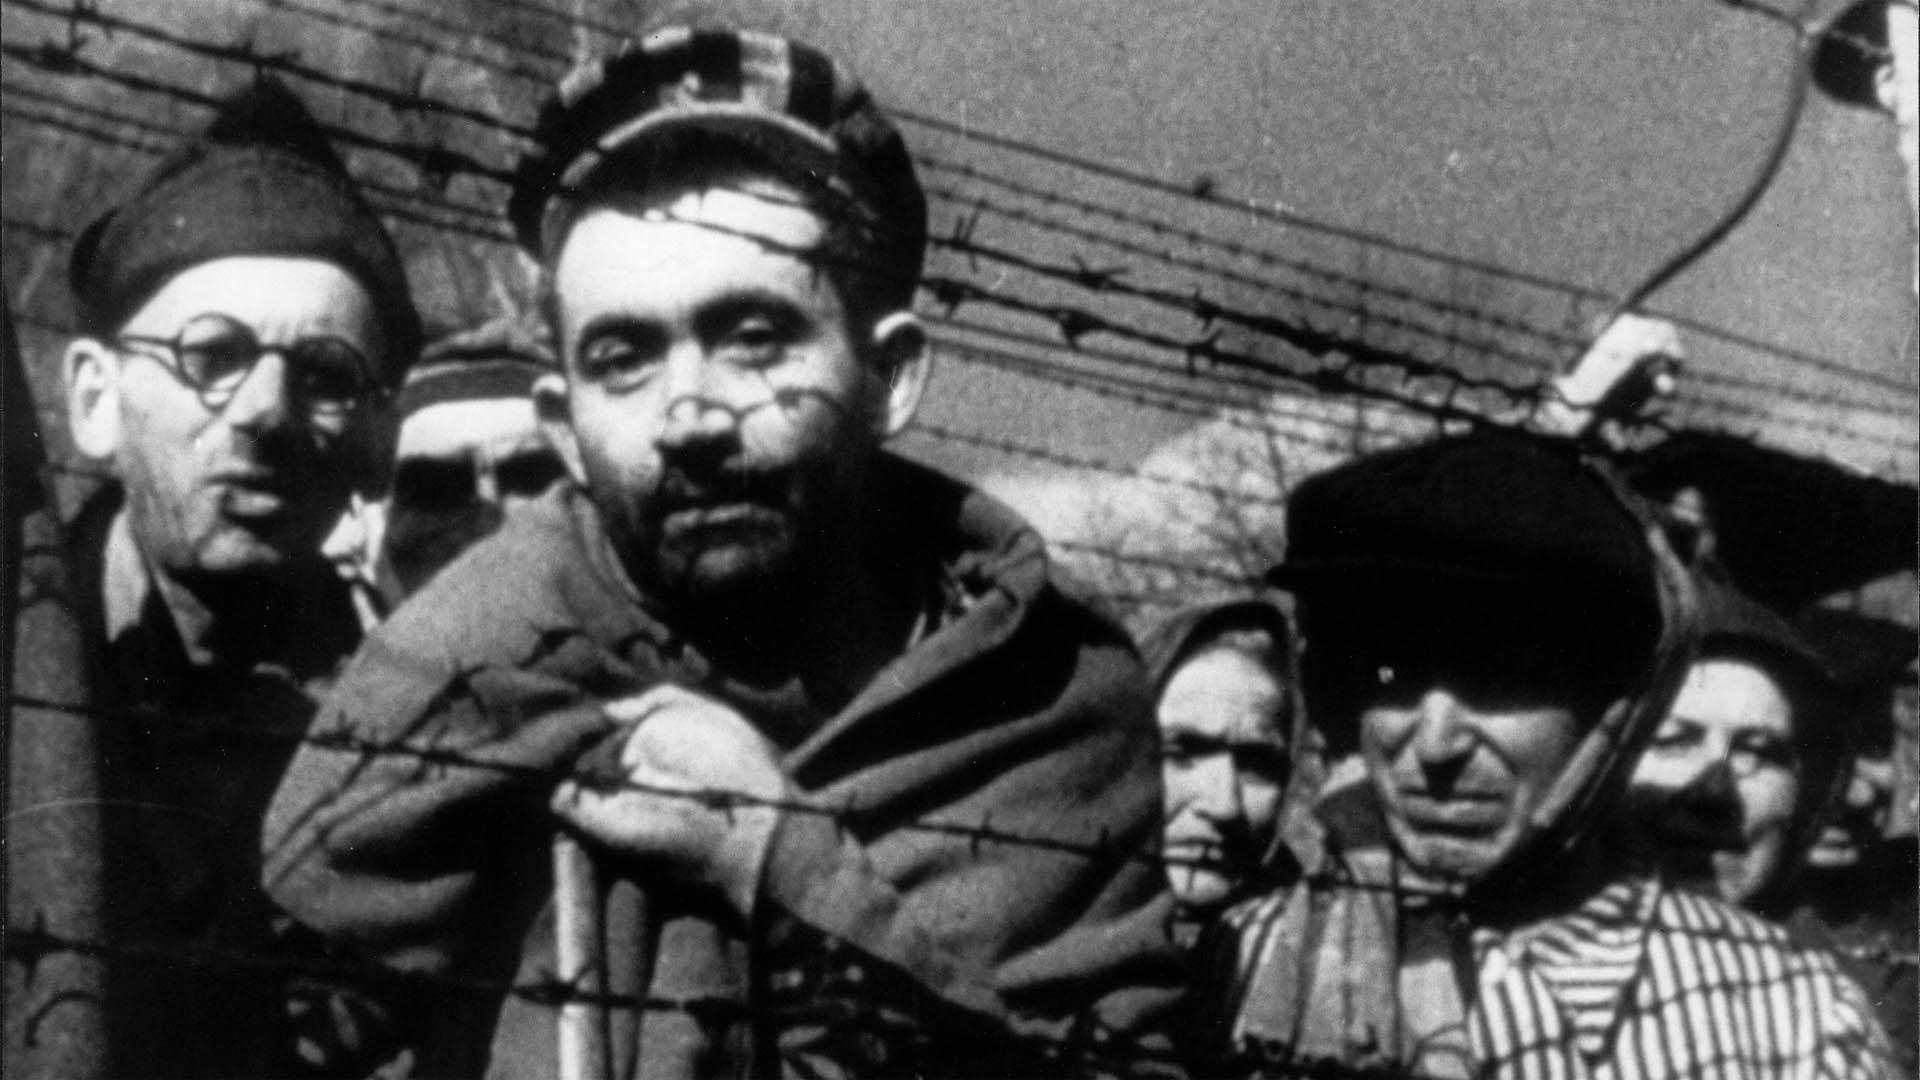 filme sobre segunda guerra mundial: Noite e Neblina